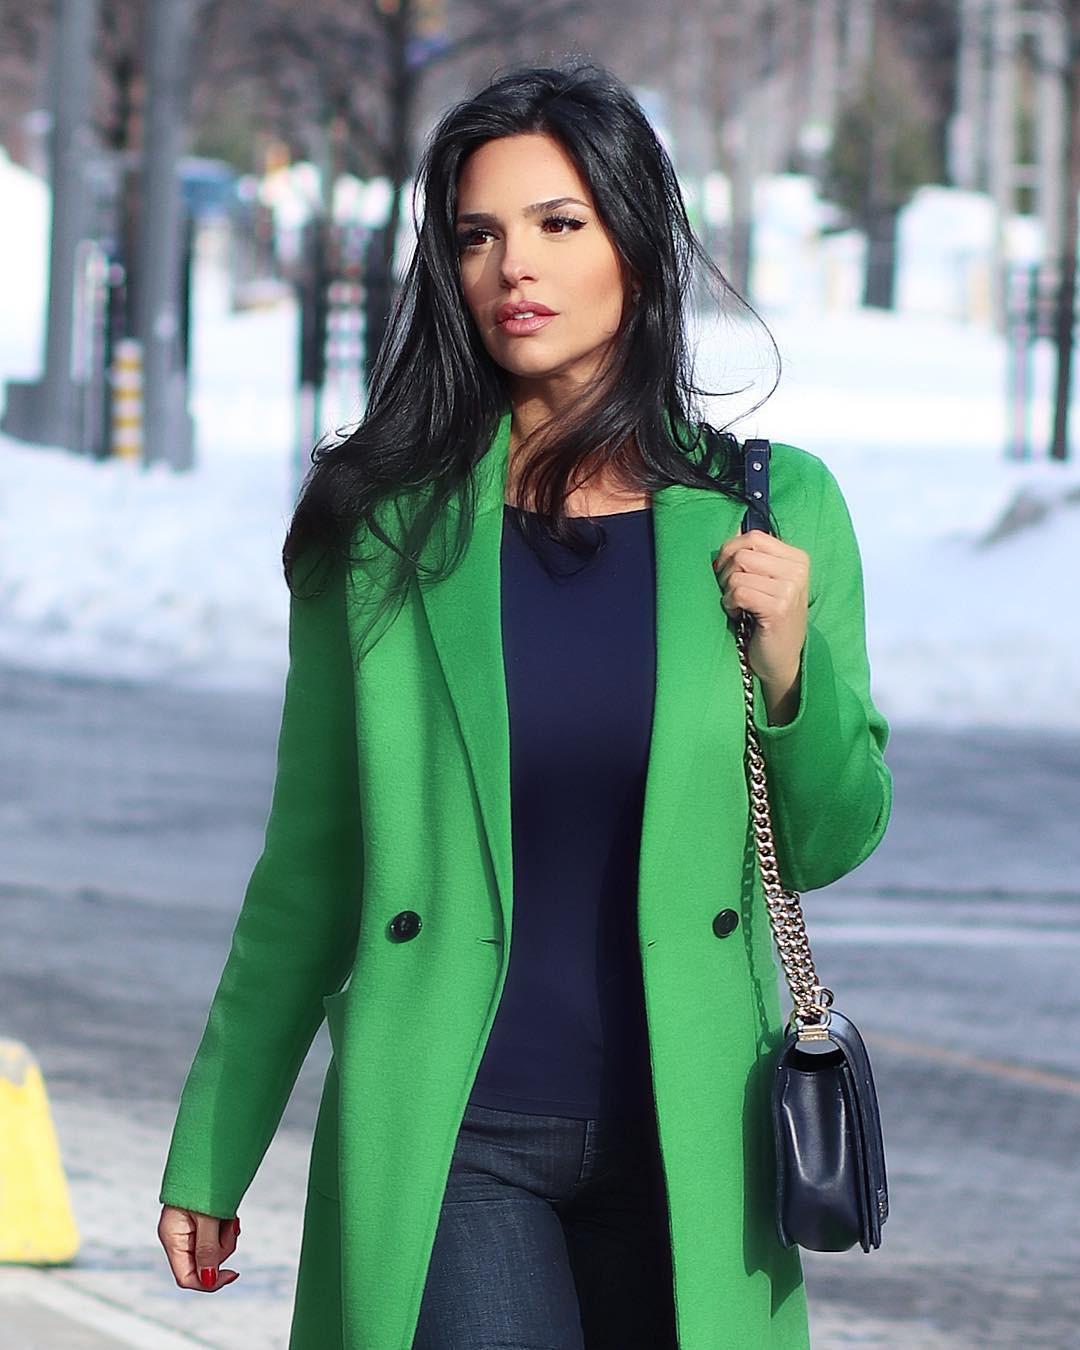 Yellow and green overcoat, jacket, coat